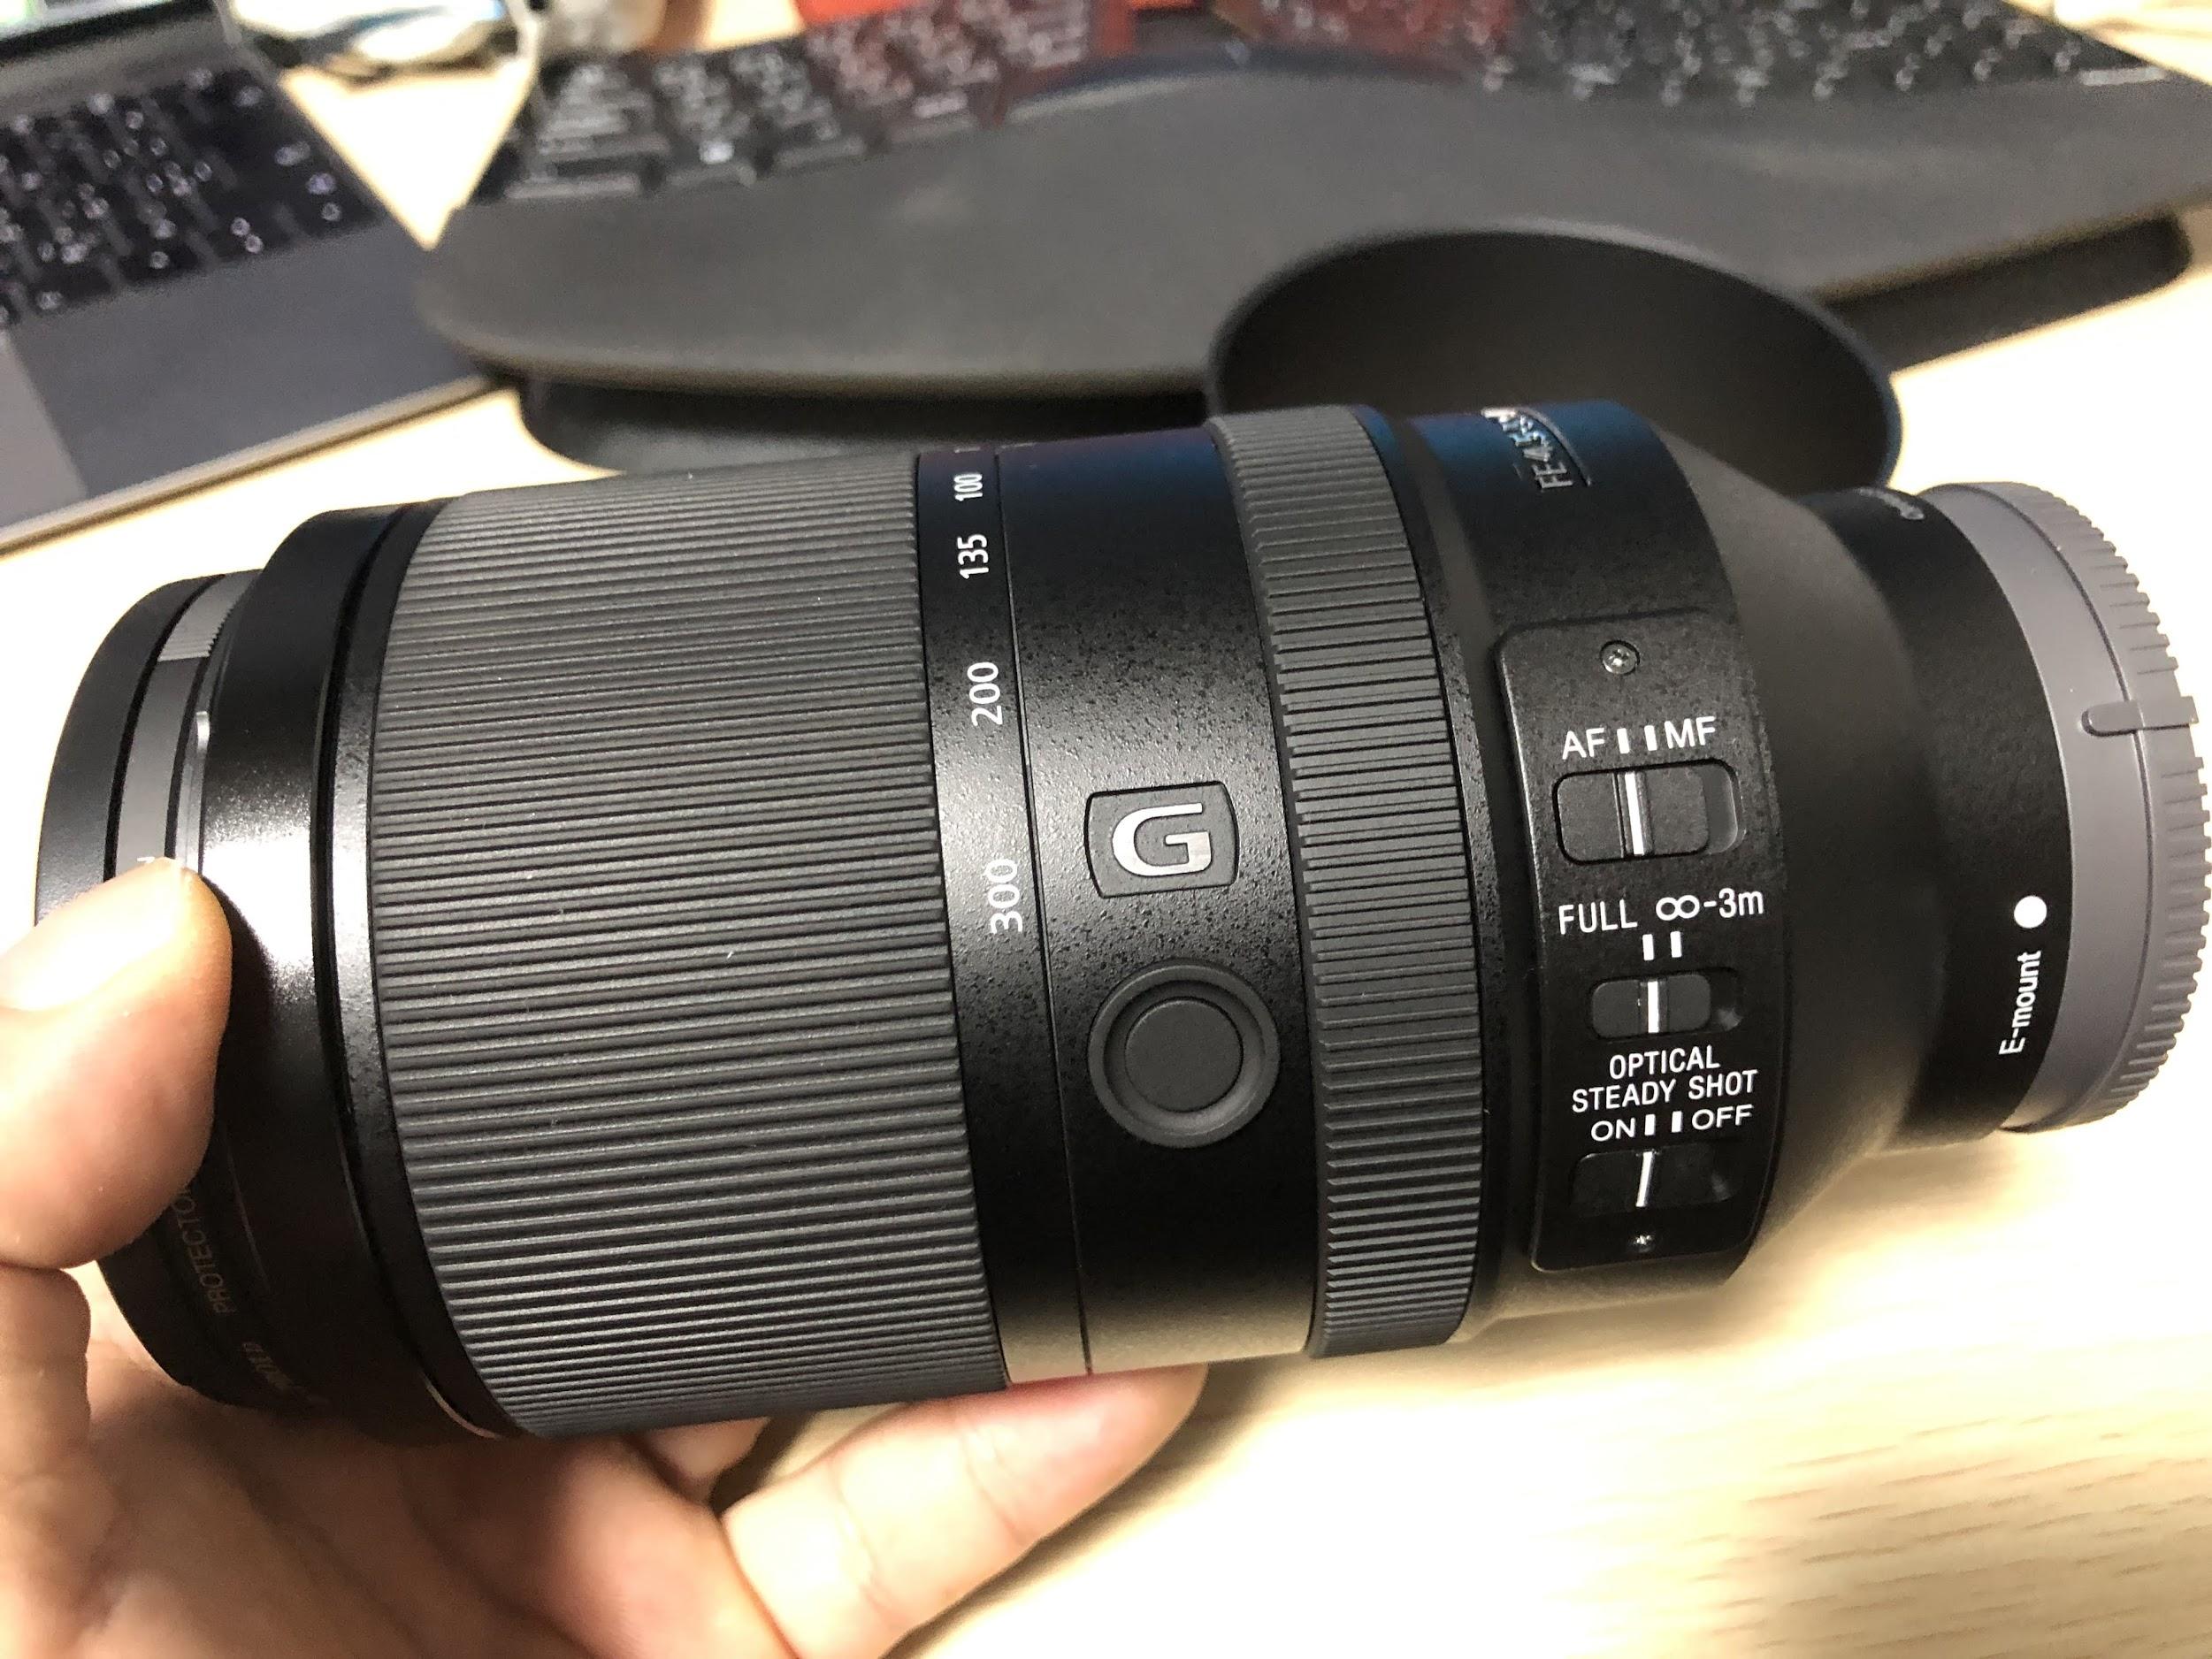 Eマウント望遠レンズ SONY FE 70-300mm F4.5-5.6 G – SEL70300G を買った